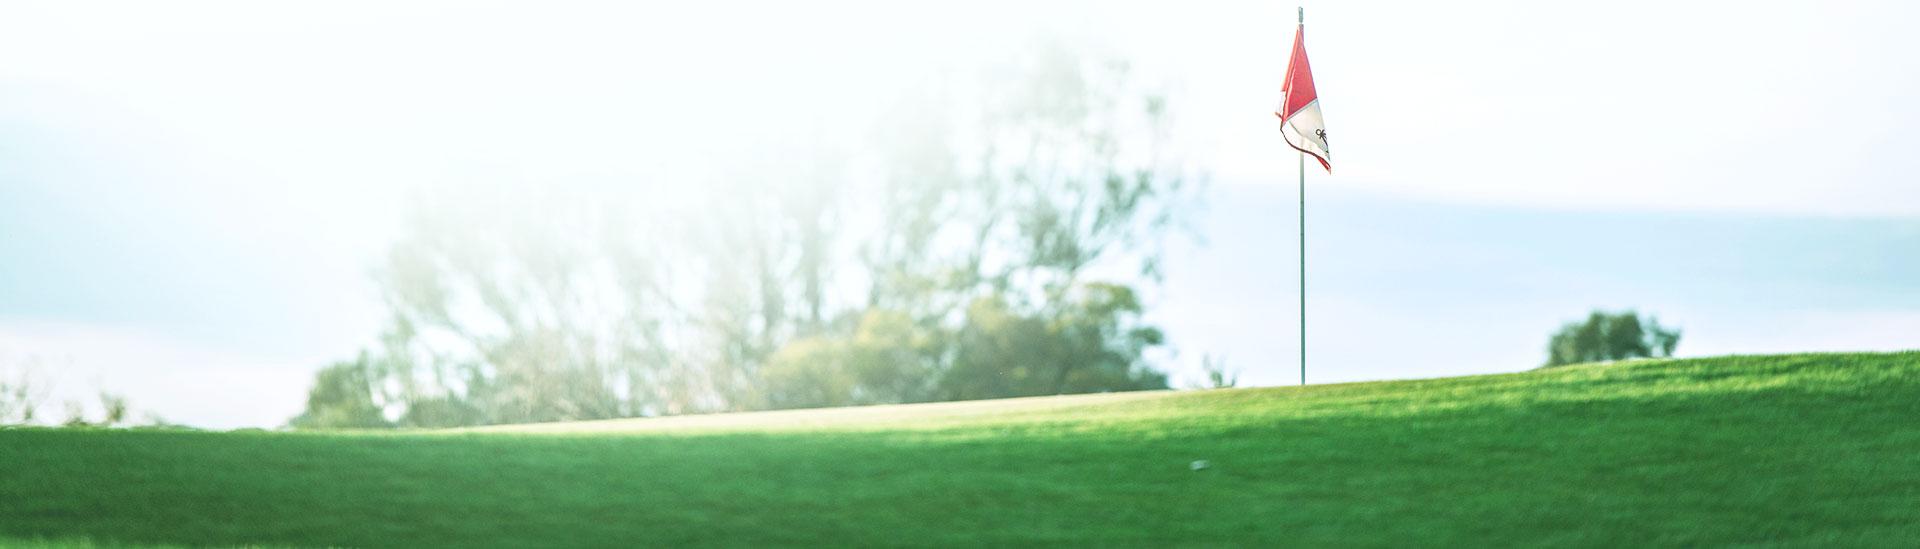 Kids Golf Club Sturgeon County